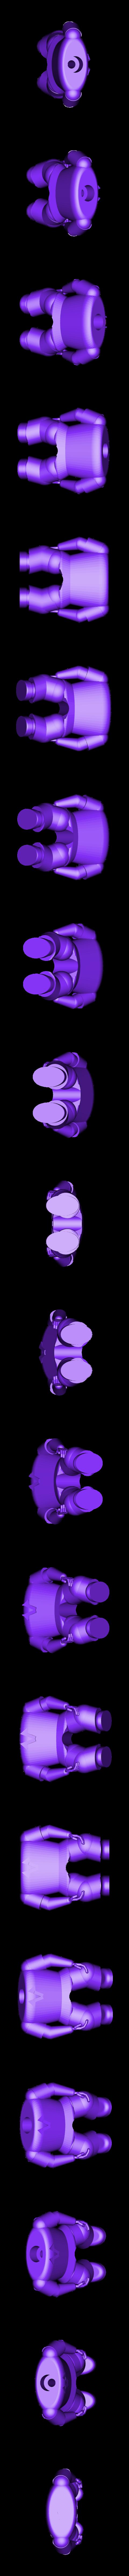 bodywithHands.stl Download free STL file Bobble Head • Model to 3D print, wjordan819